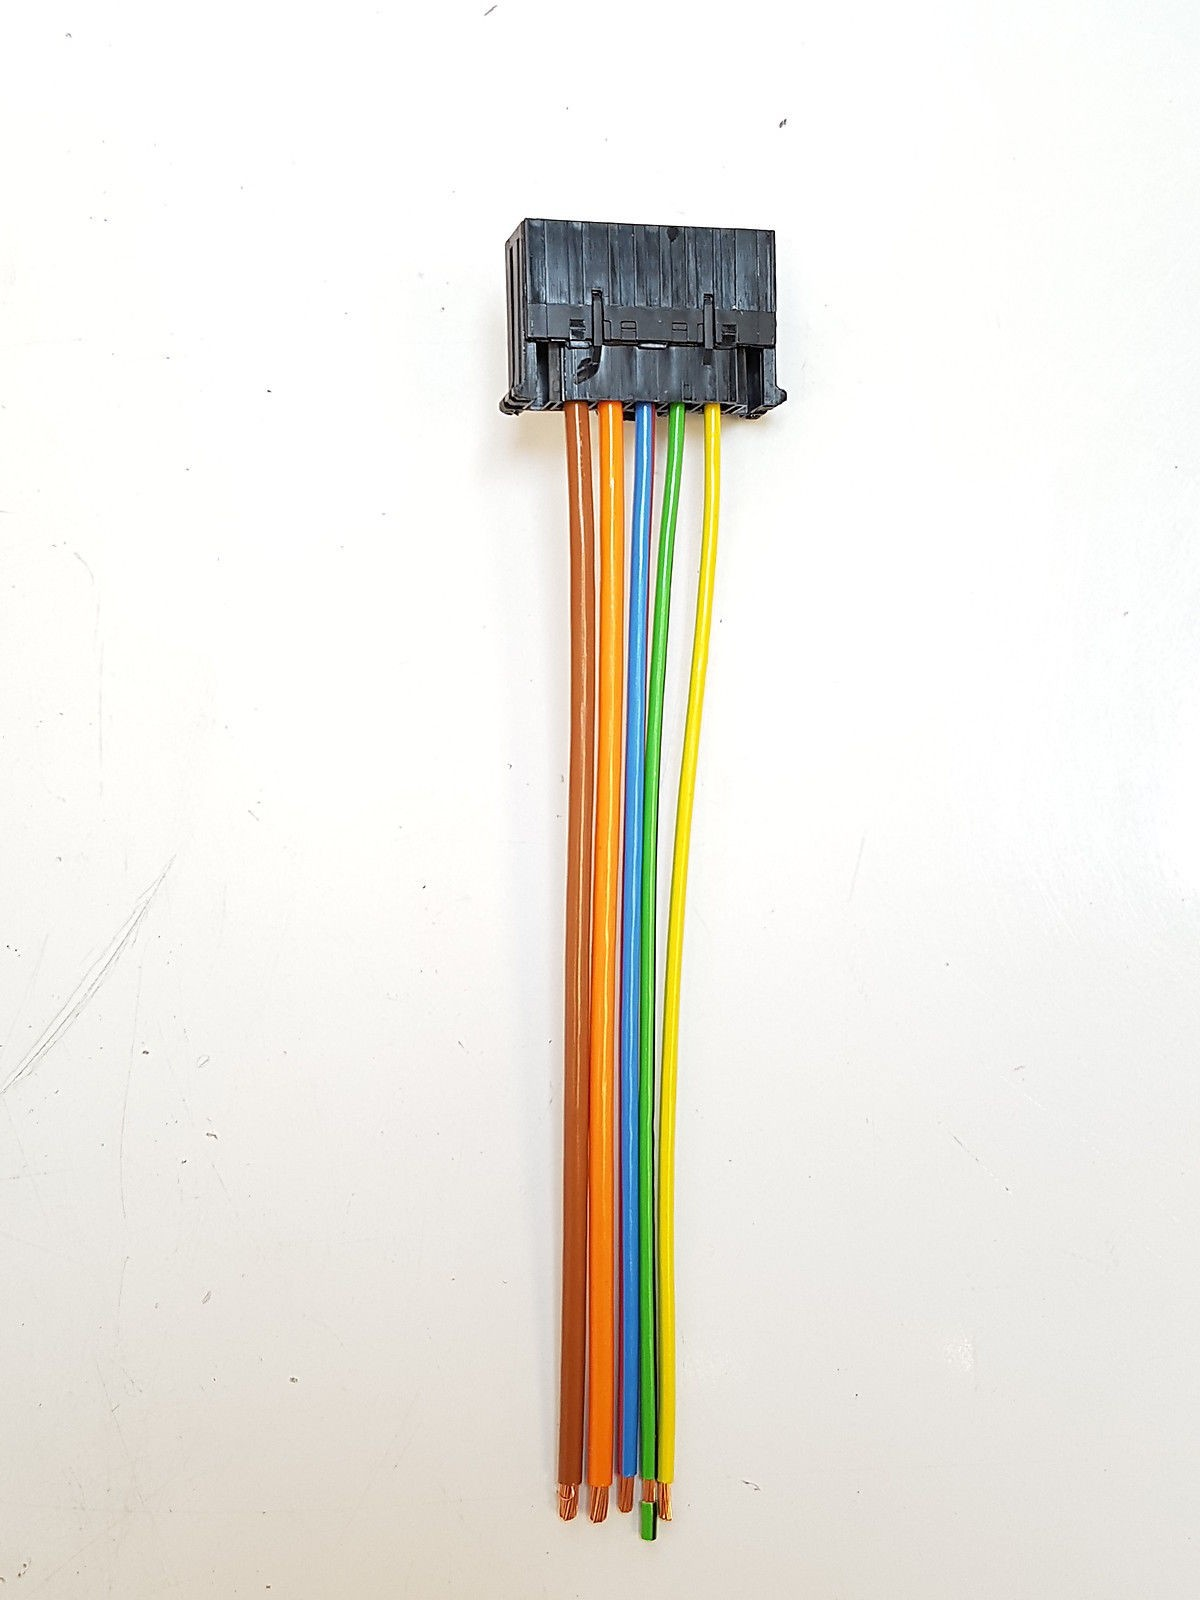 Heater Motor Fan Blower Resistor Wiring Loom For Vauxhall Adam Corsa D Corsa E